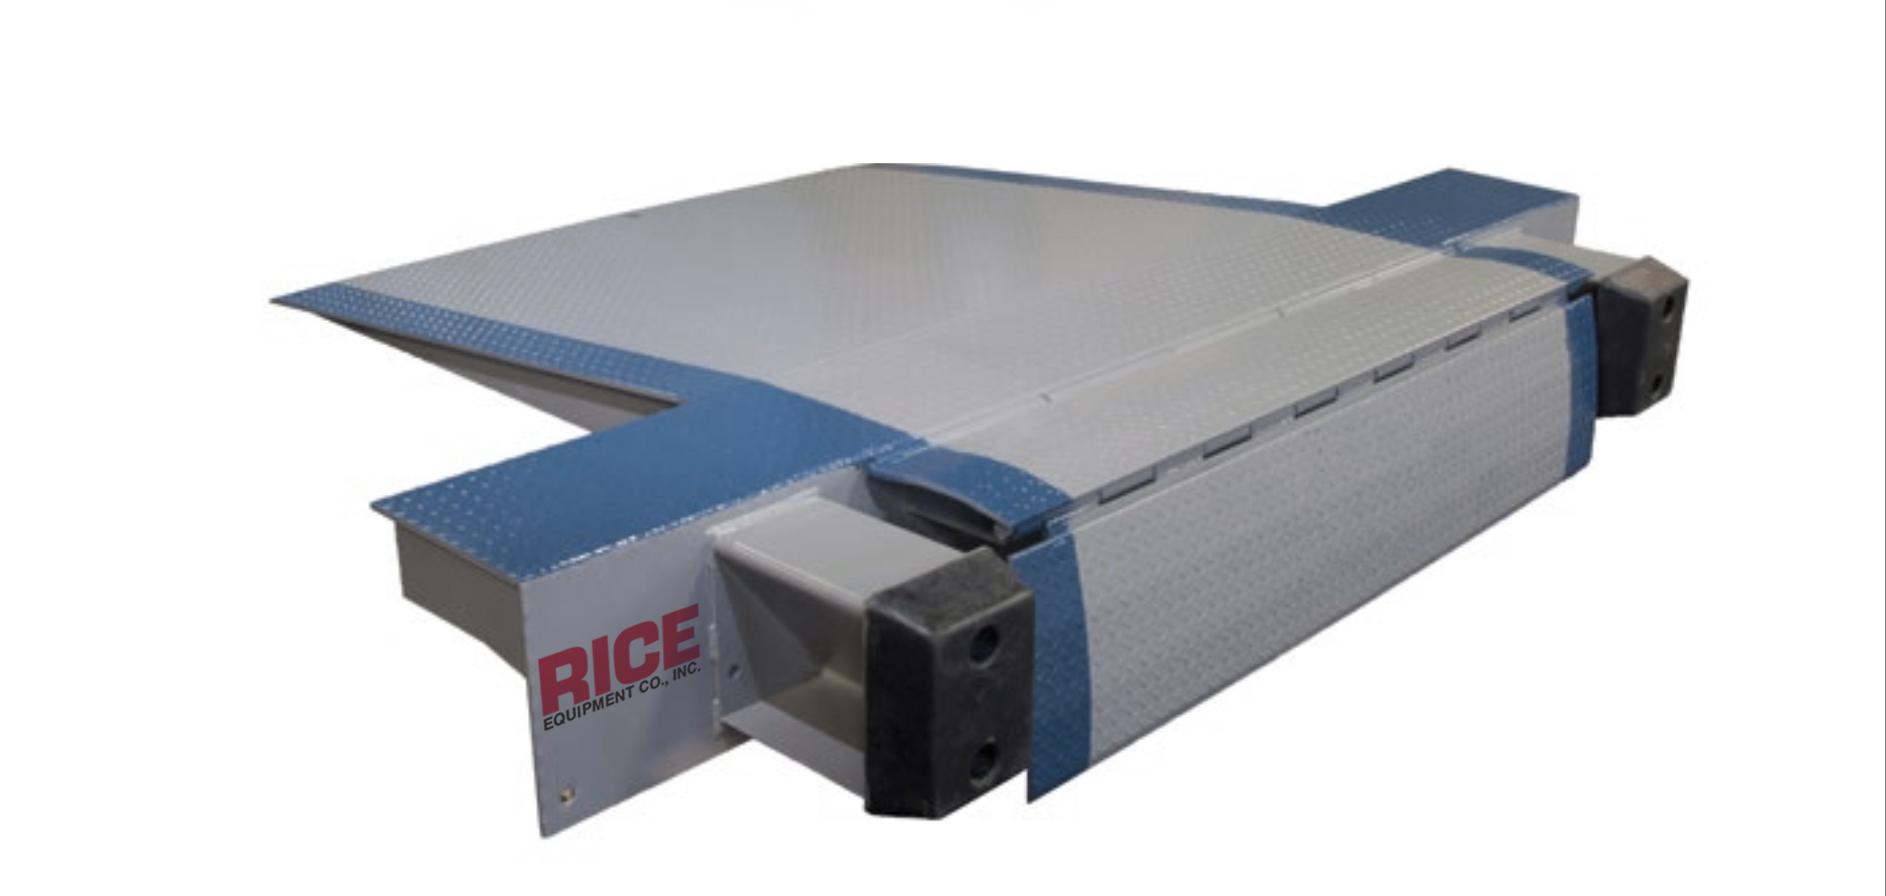 Raised EOD Leveler Low Dock Leveler with Side Seals for Door Rice Equipment Custom Loading Dock Equipment St Louis Missouri and Illinios.jpg